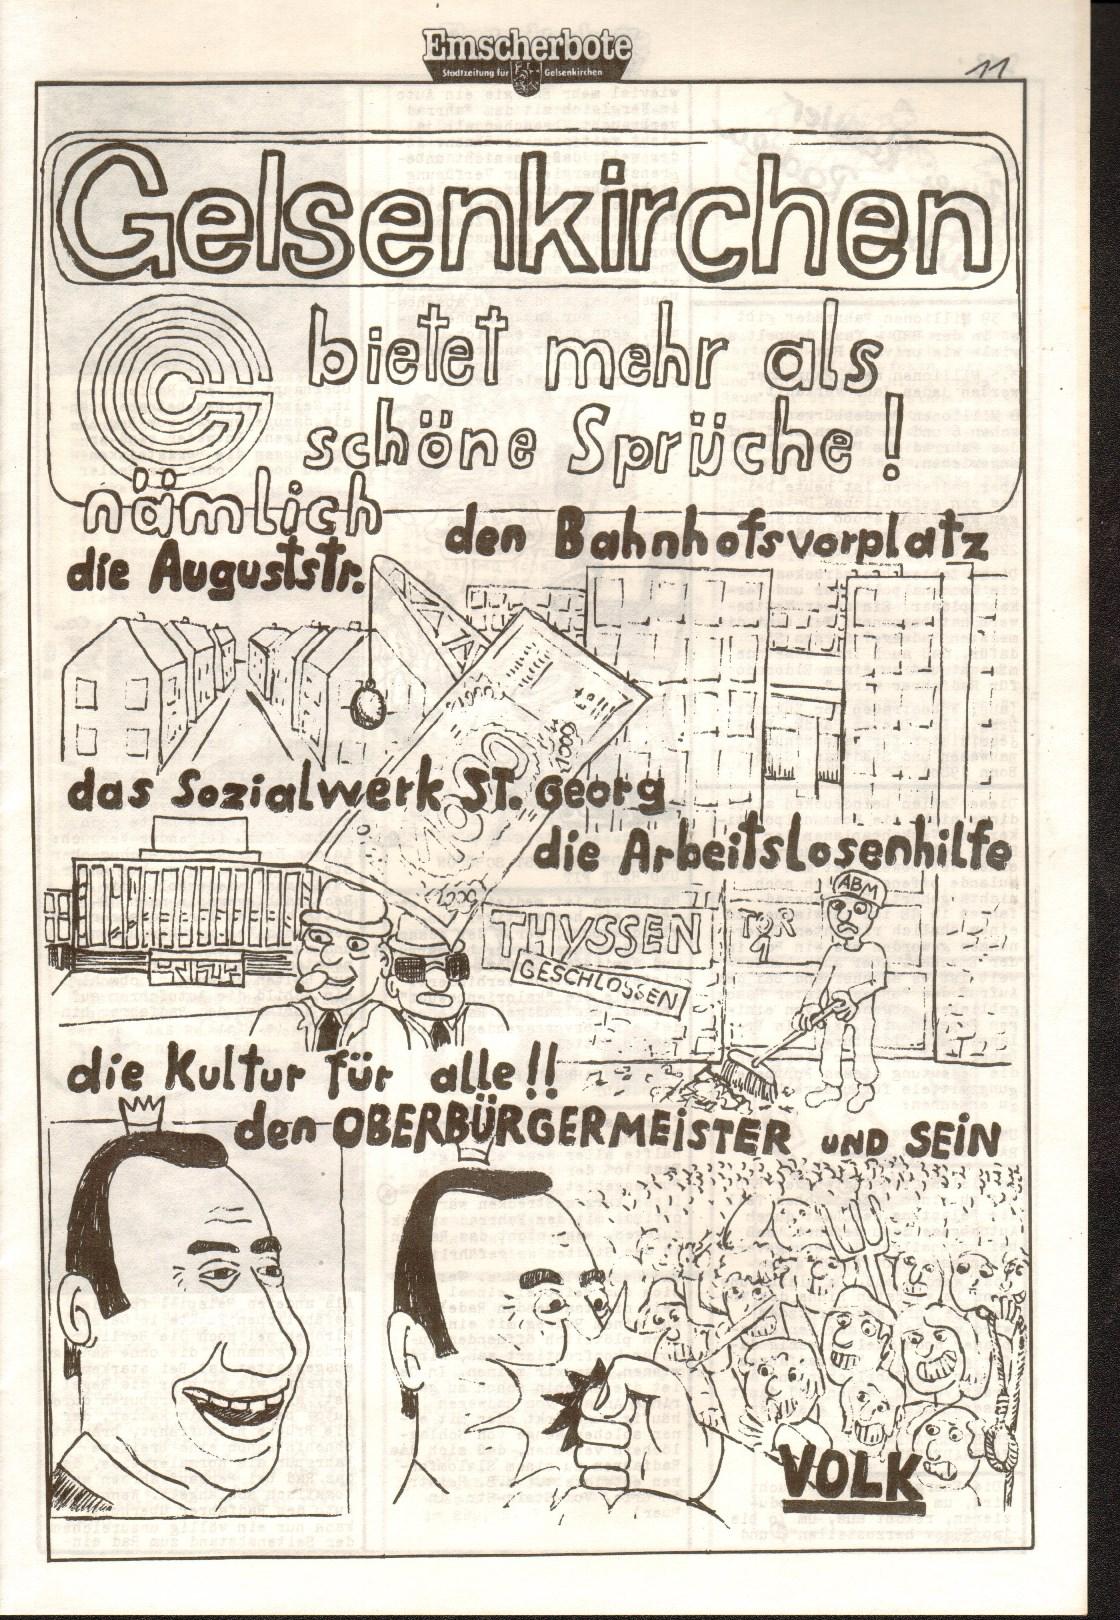 Gelsenkirchen_Emscherbote_1982_18_11